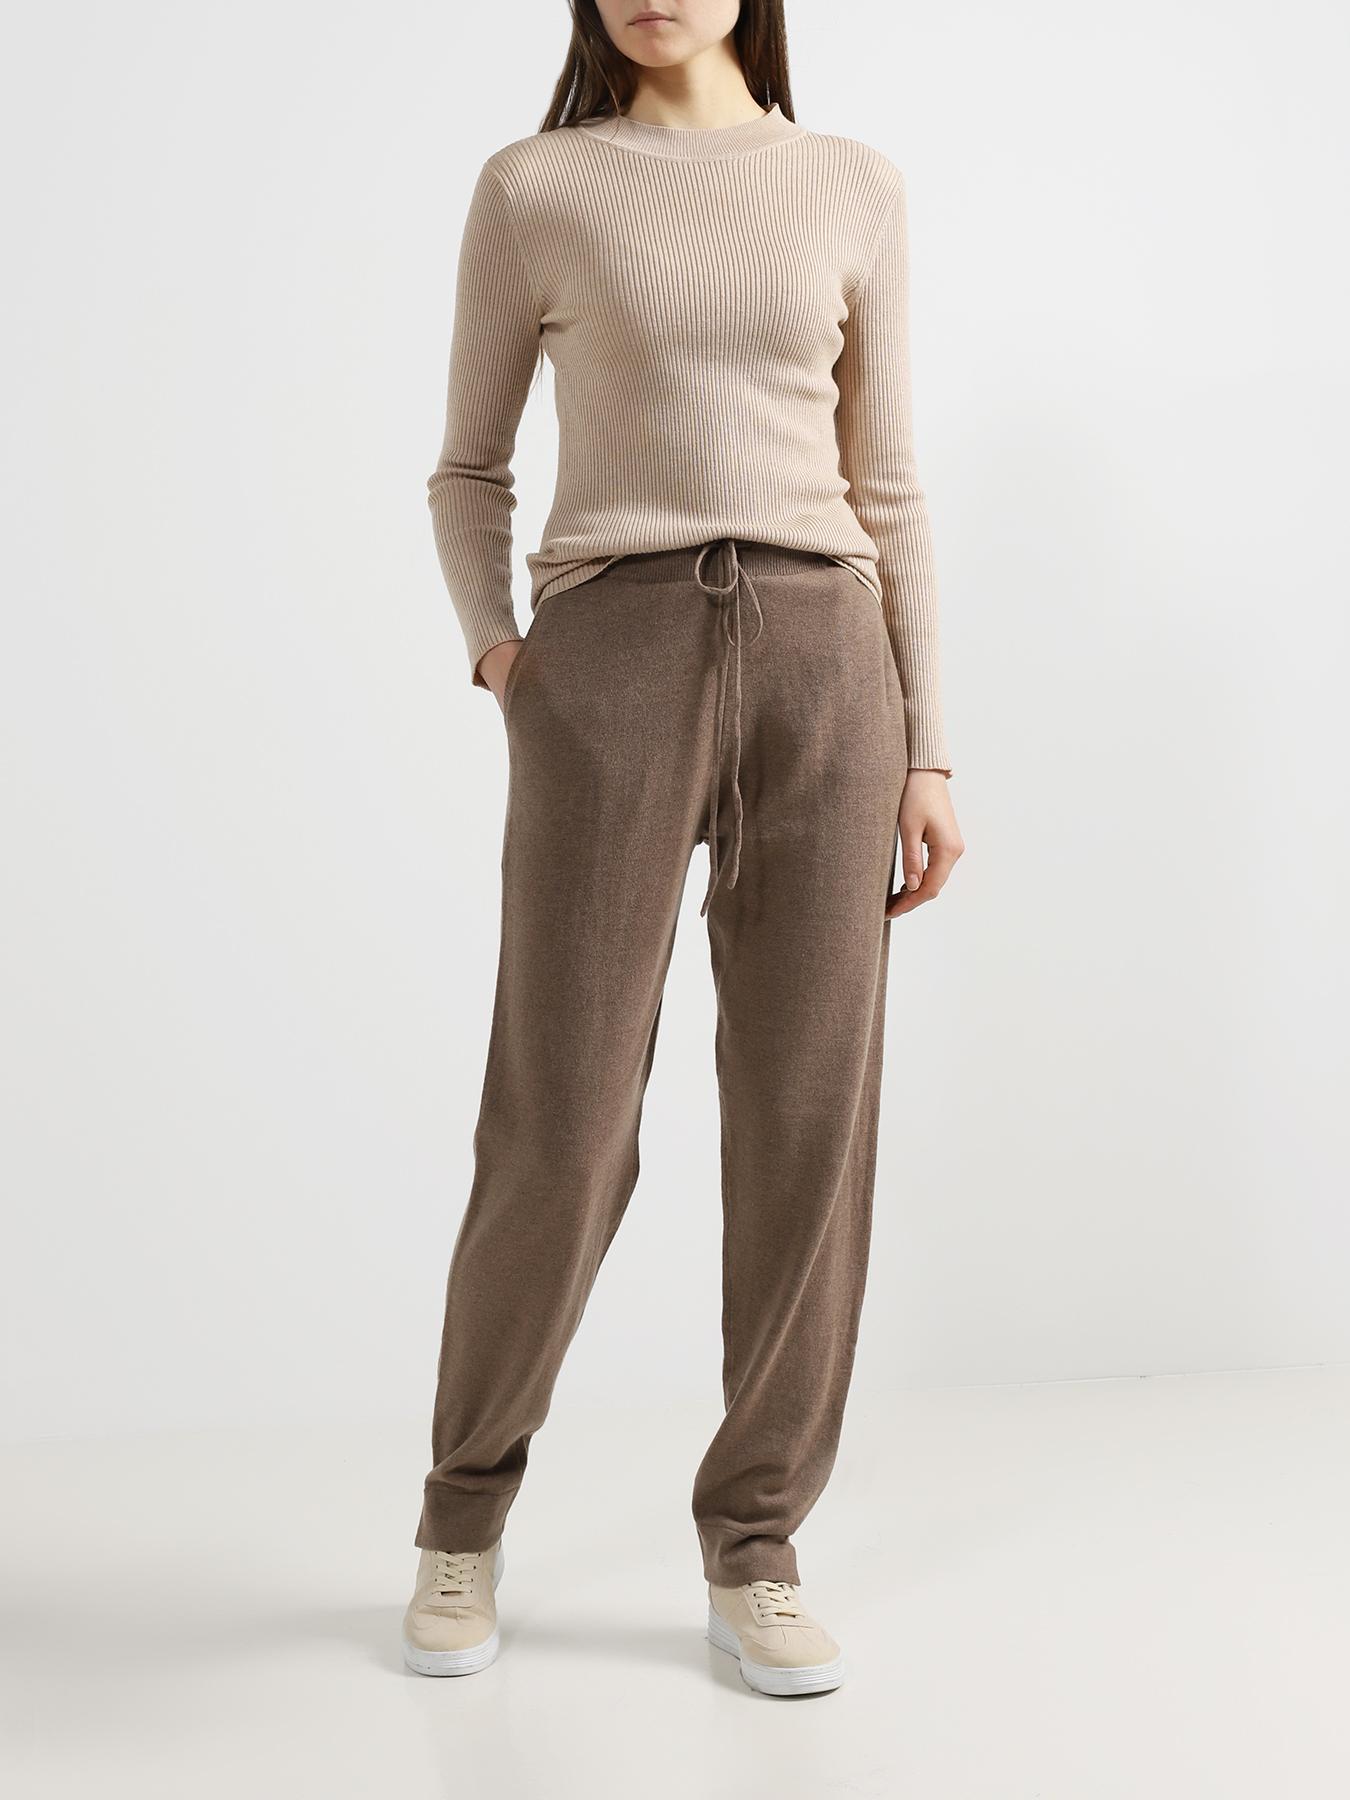 Брюки Korpo Женские брюки